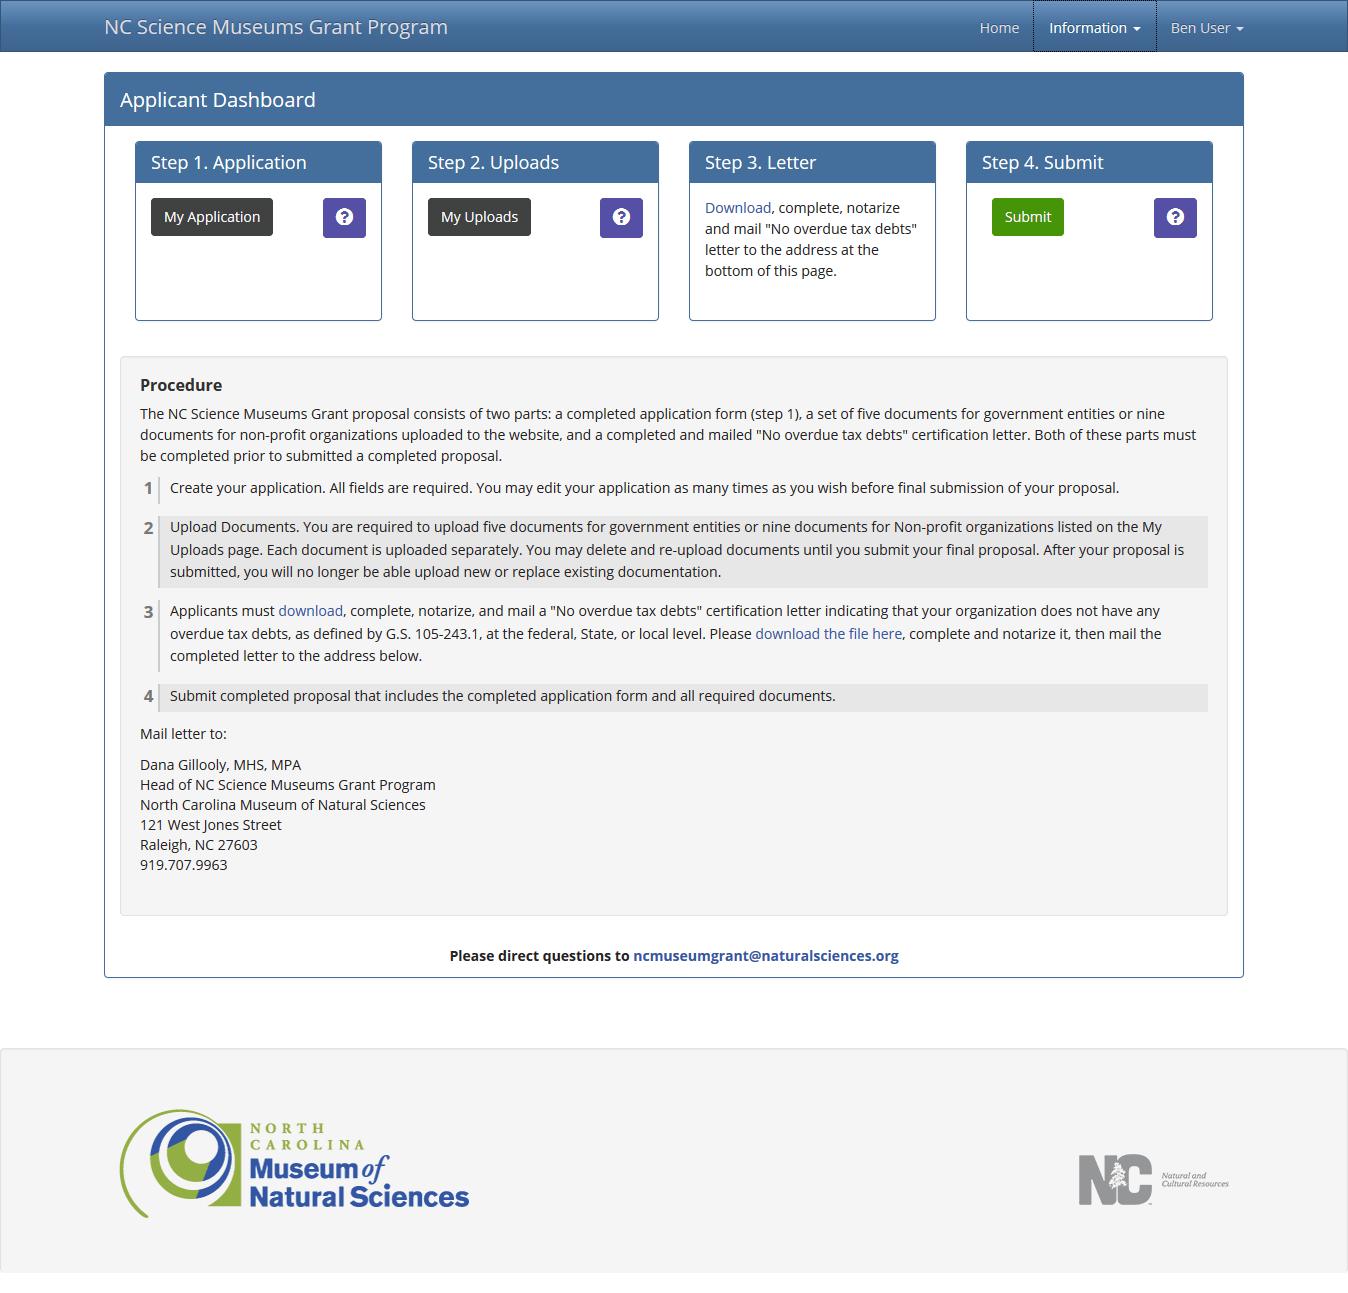 applicant_dashboard